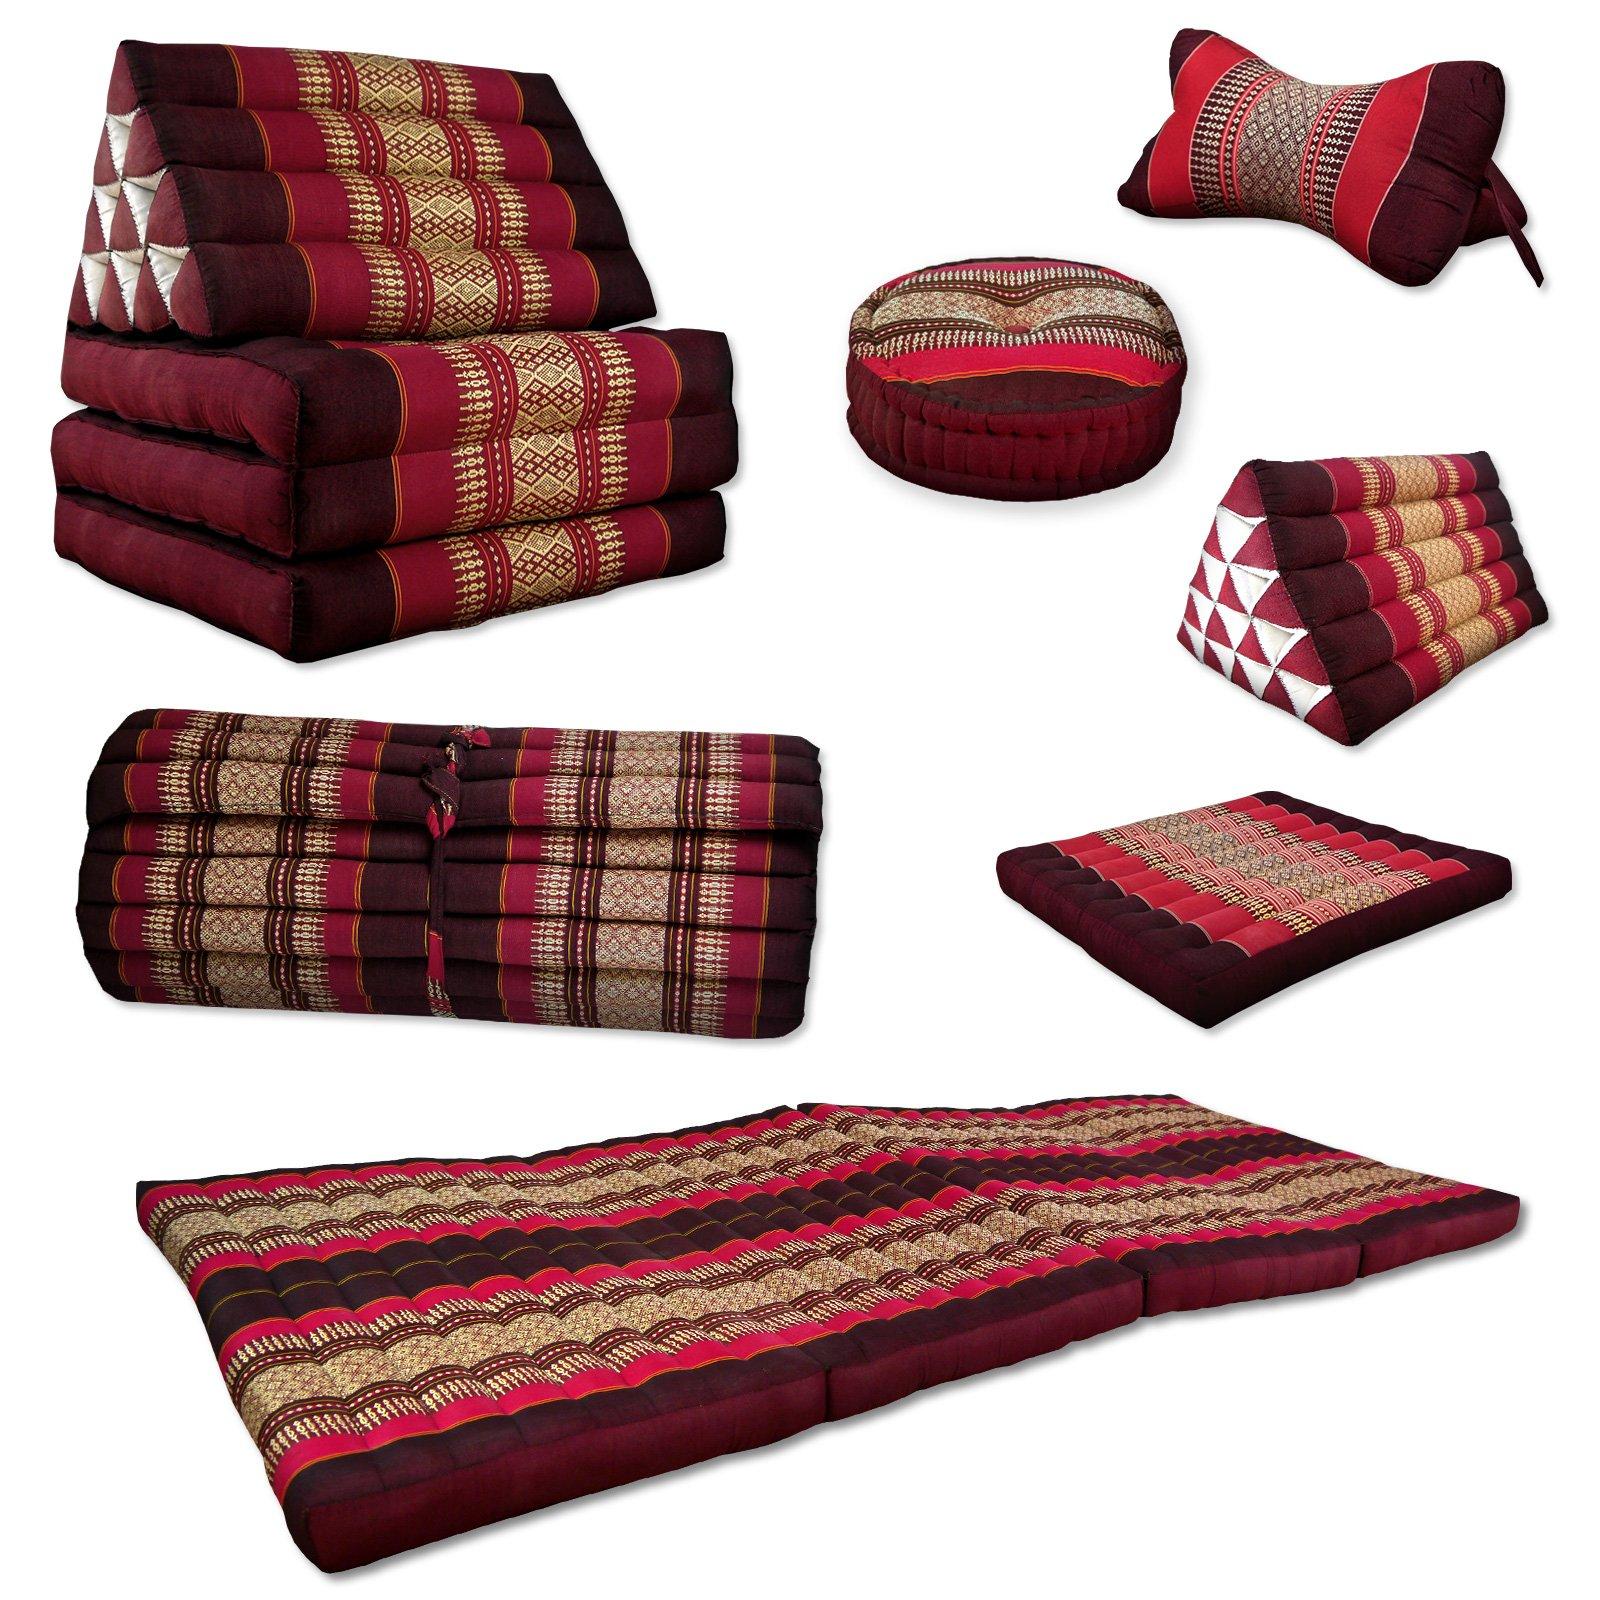 Asia Wohnstudio 3 Fold With Extra Large Triangle Cushion, 100% Natural Kapok Filling, Xxl Jumbo Thai Pillow, Headrest (Roll Up Mattress S) Cushion Roll S